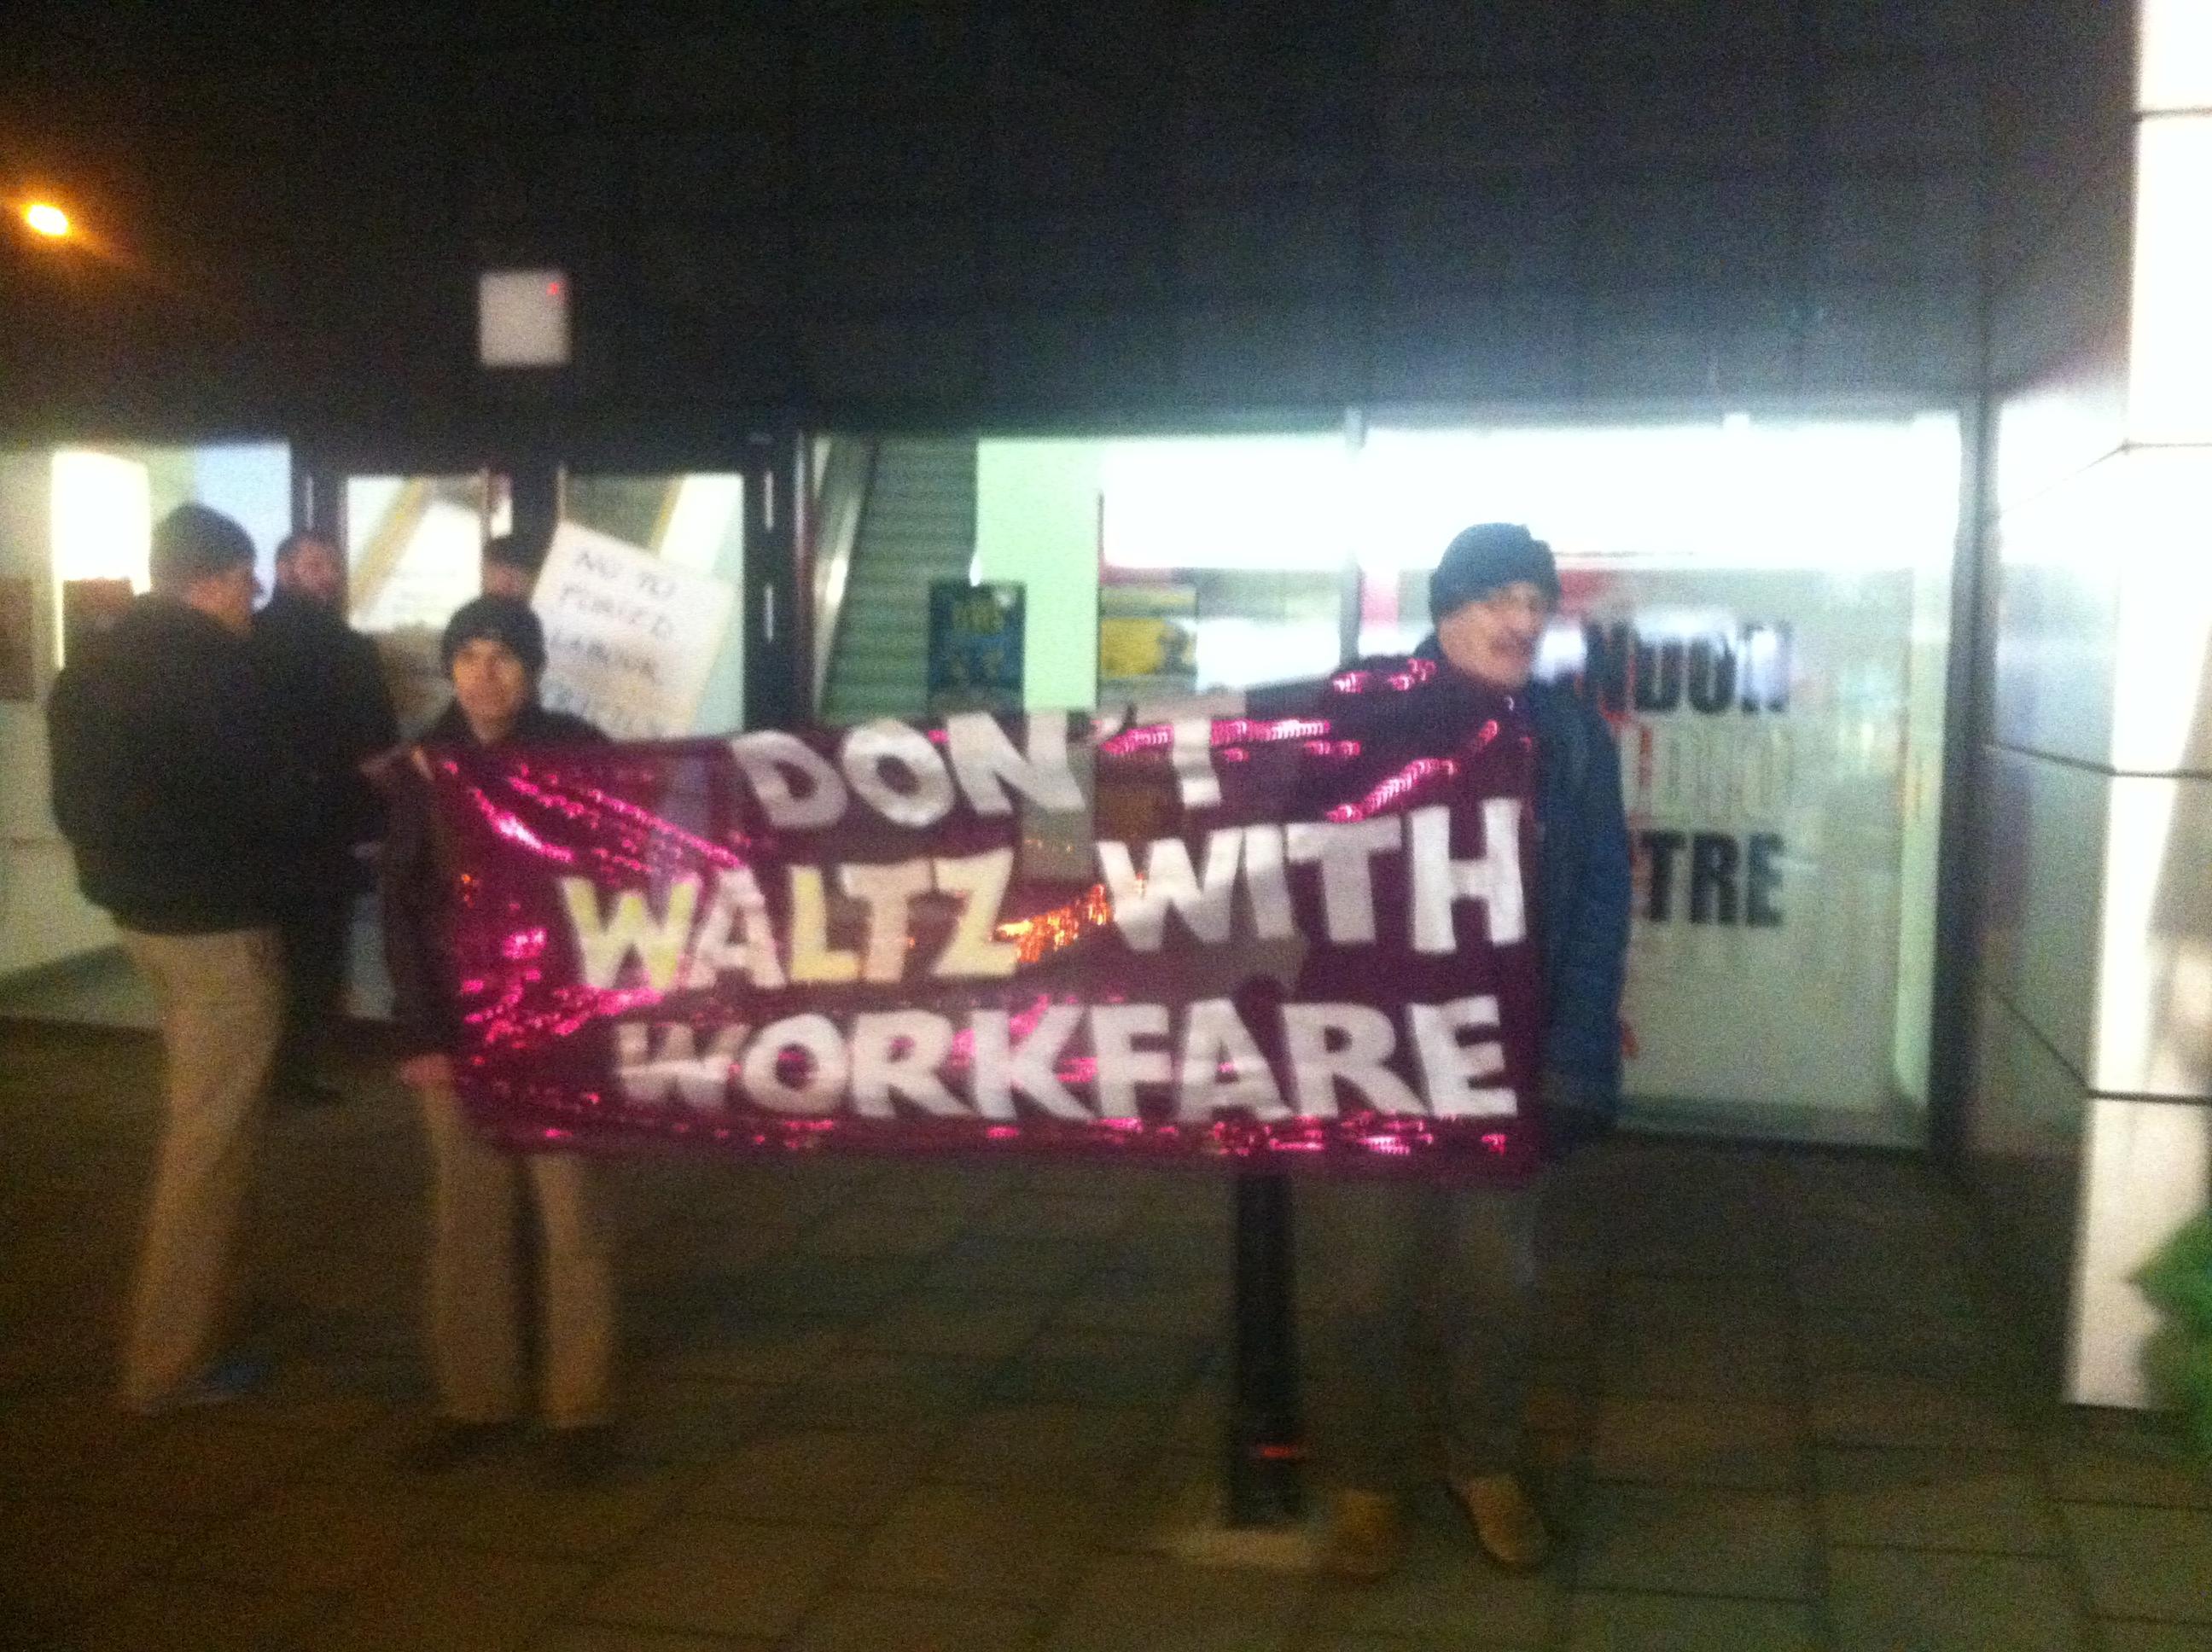 Workfare demo